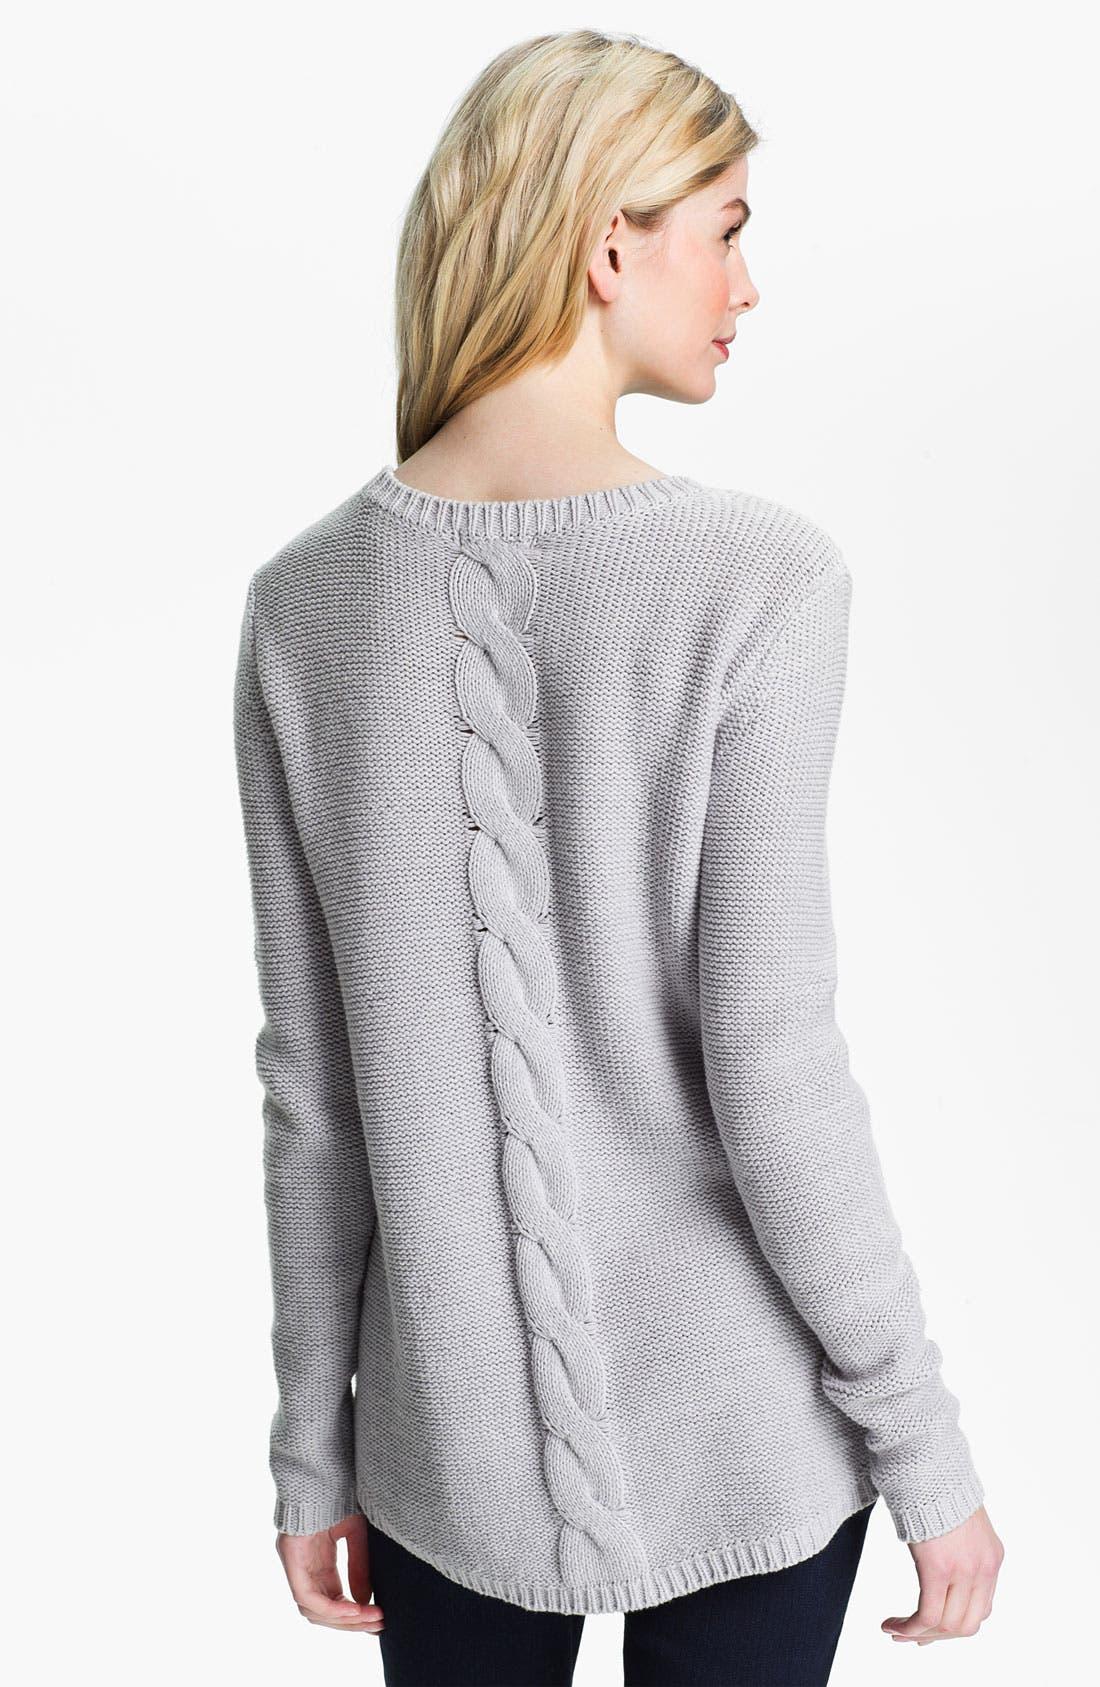 Main Image - Isaac Mizrahi Jeans 'Felicity' Sweater (Online Exclusive)